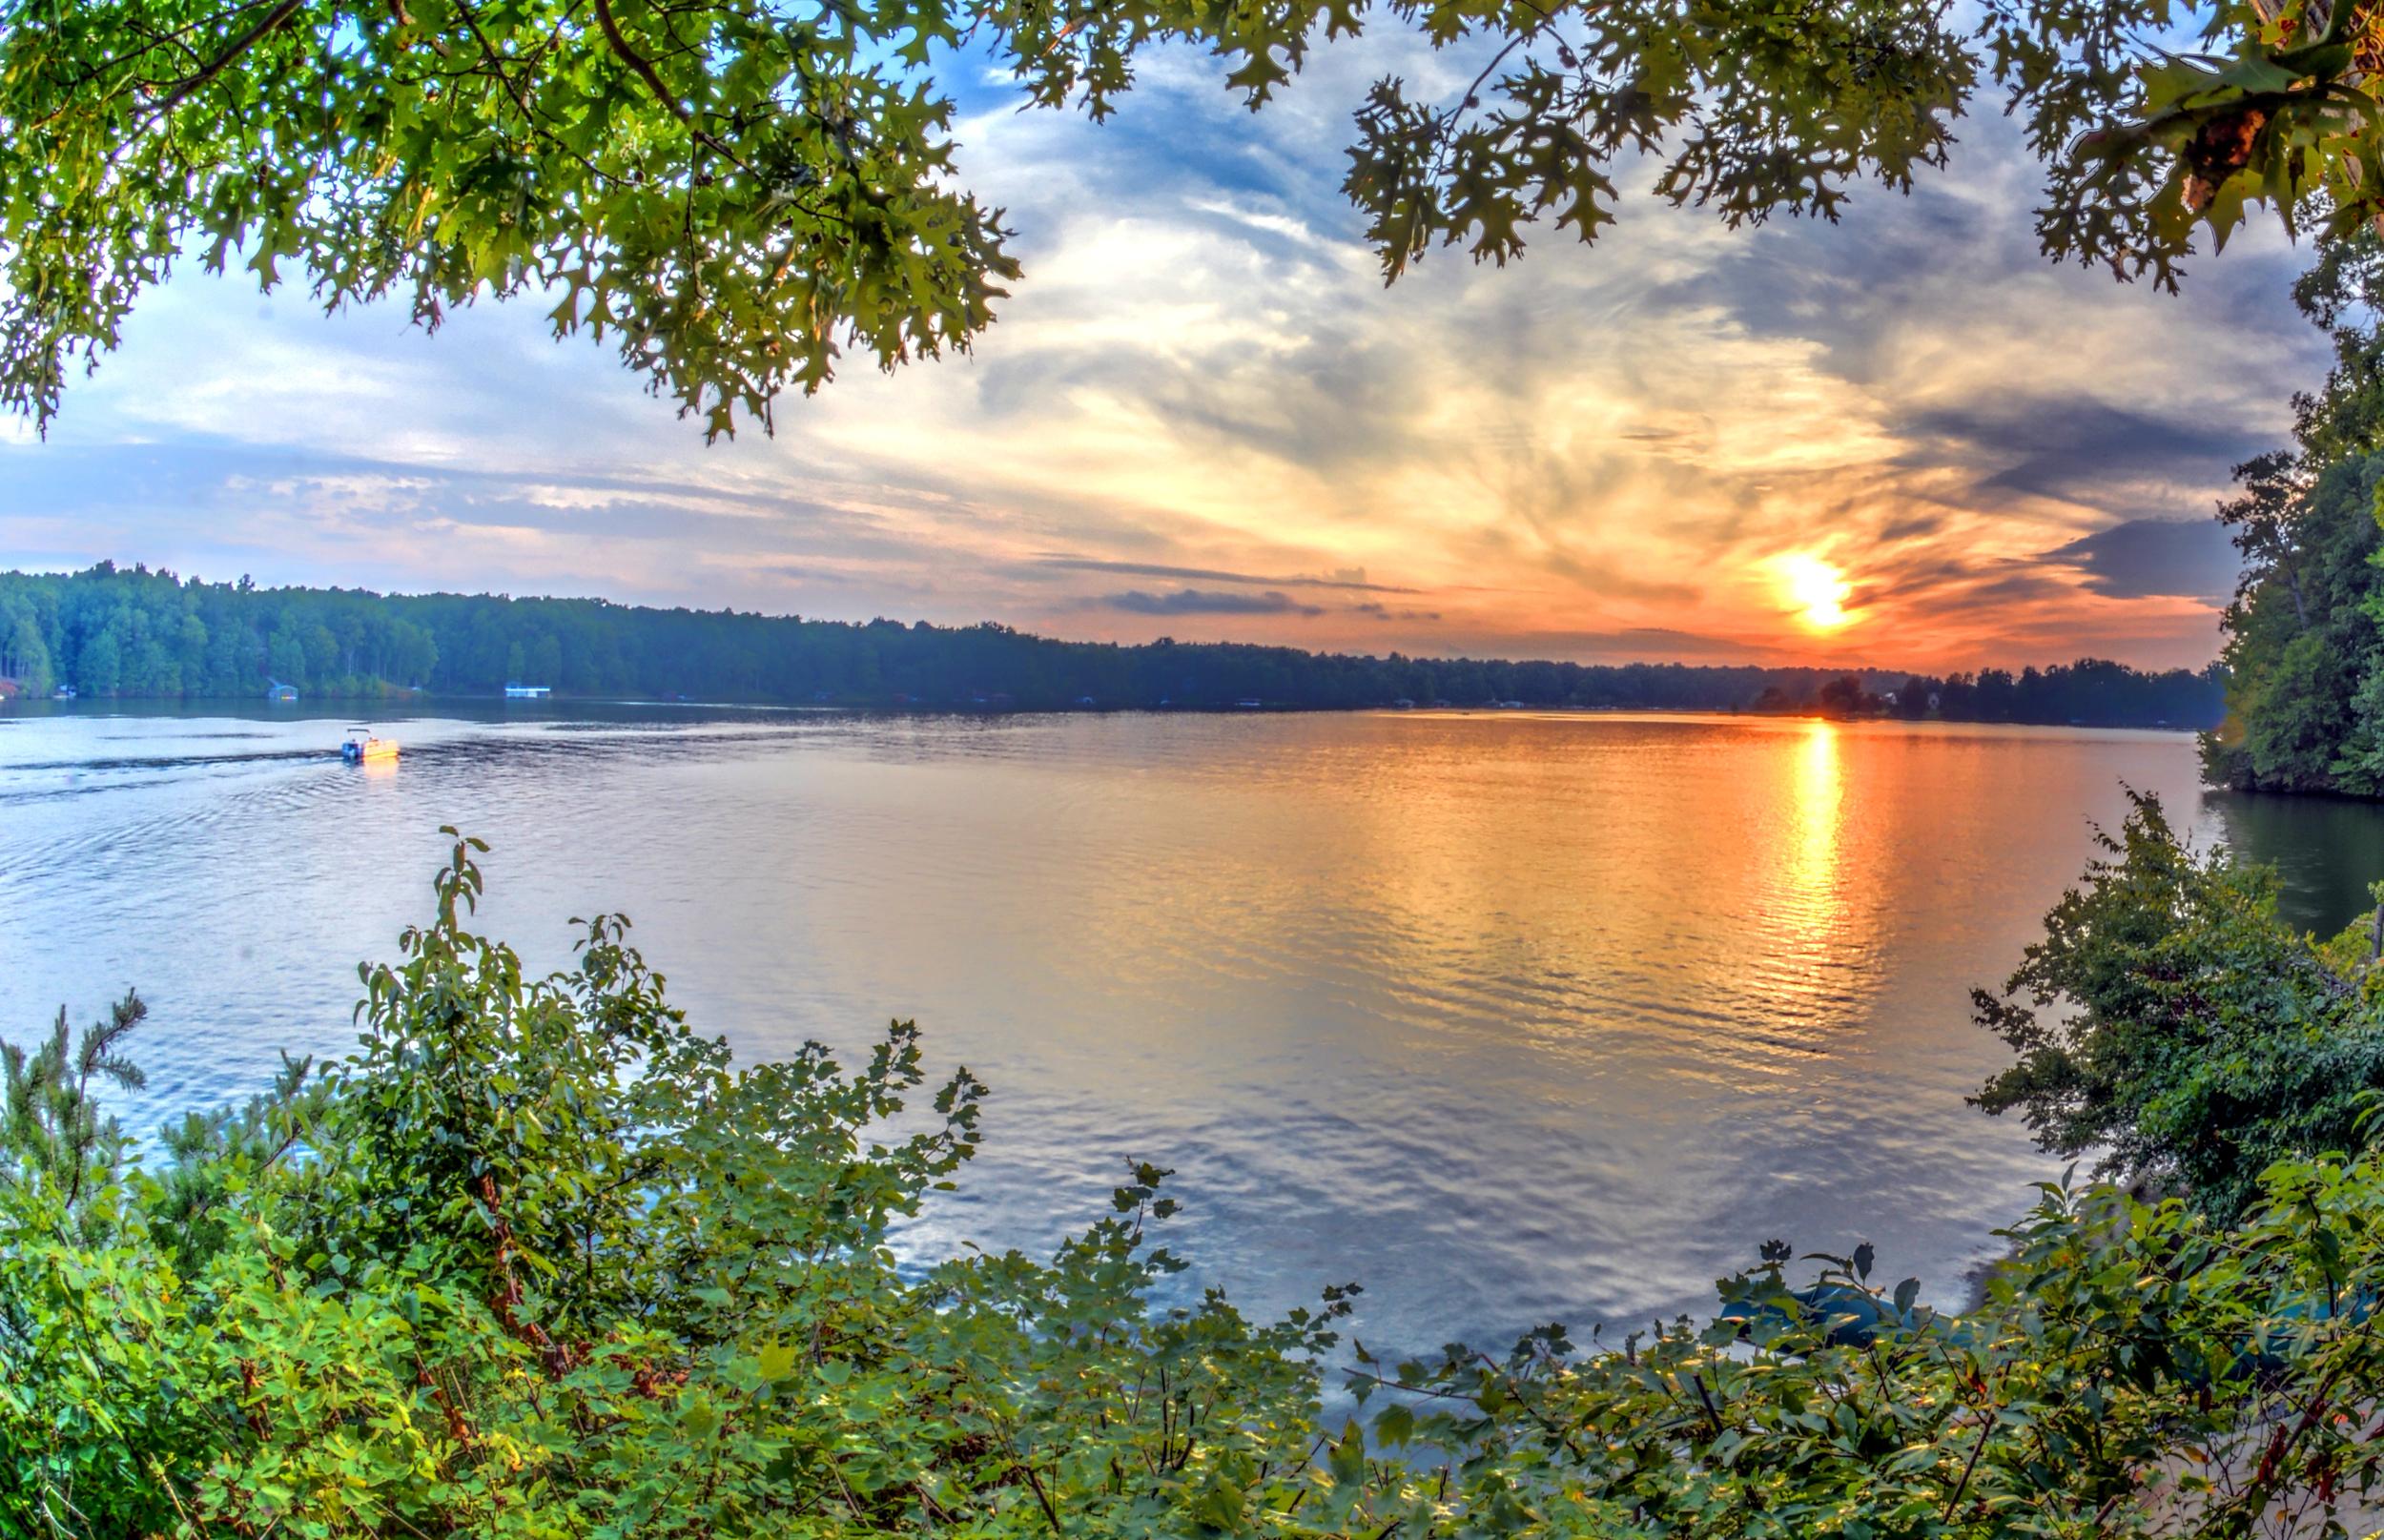 Enjoying the beautiful sunset at Lake Anna